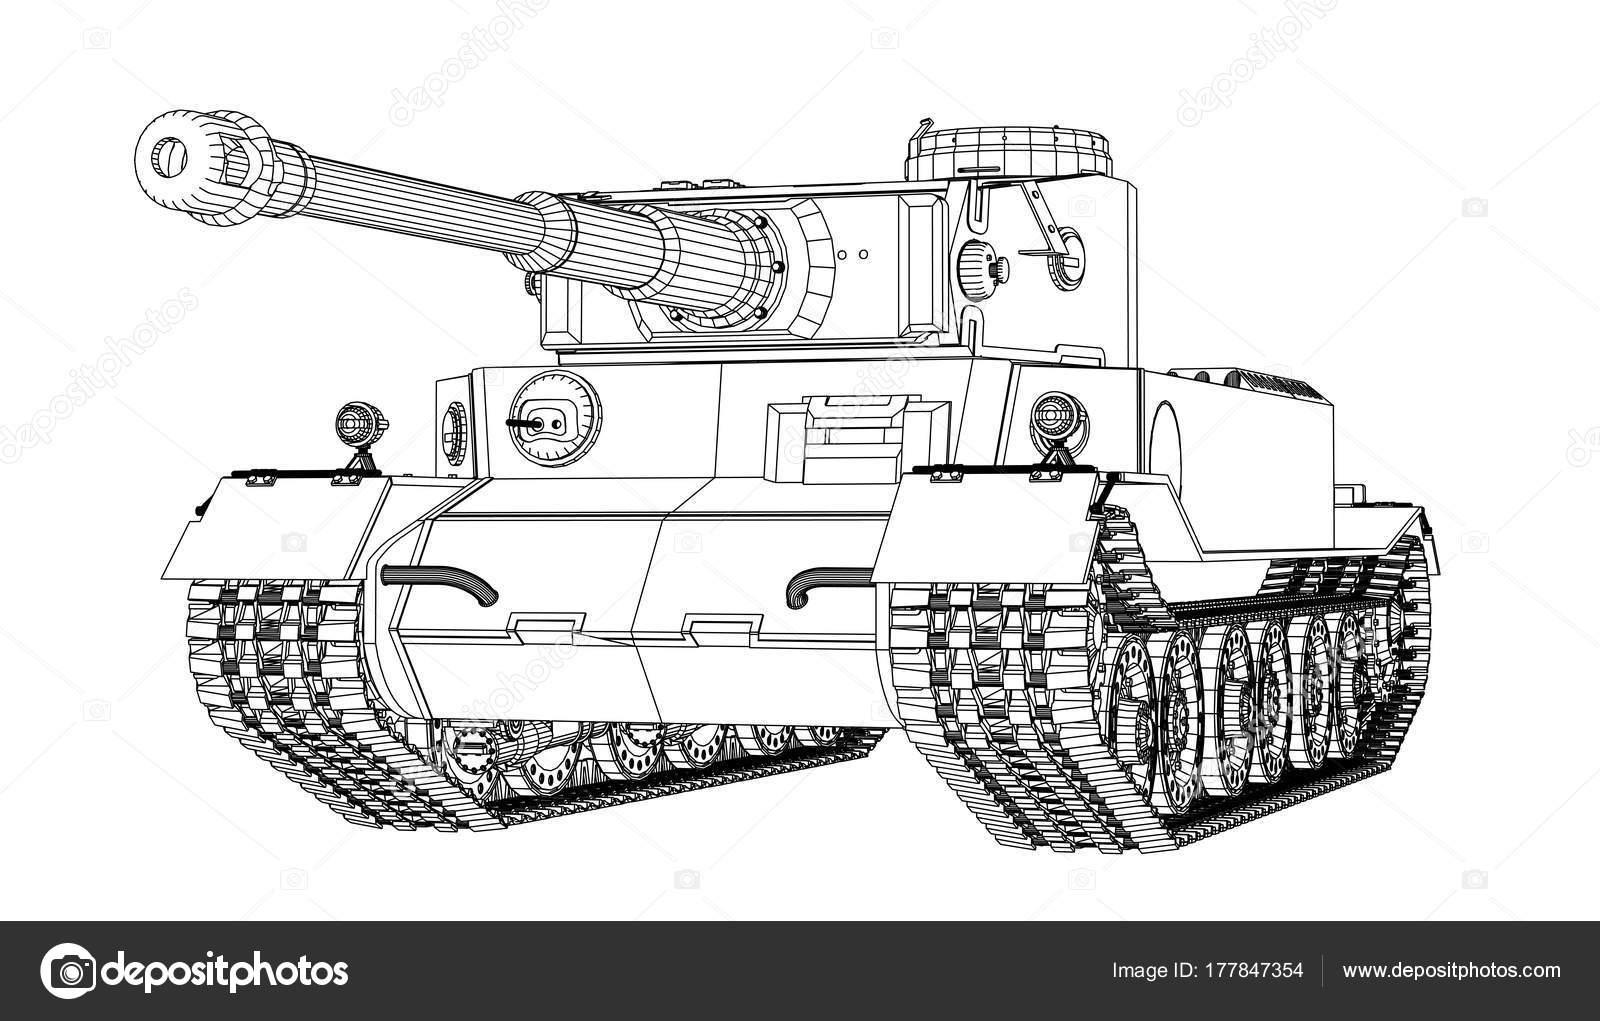 Blueprint of realistic tank stock vector cherezoff 177847354 blueprint of realistic tank stock vector malvernweather Choice Image